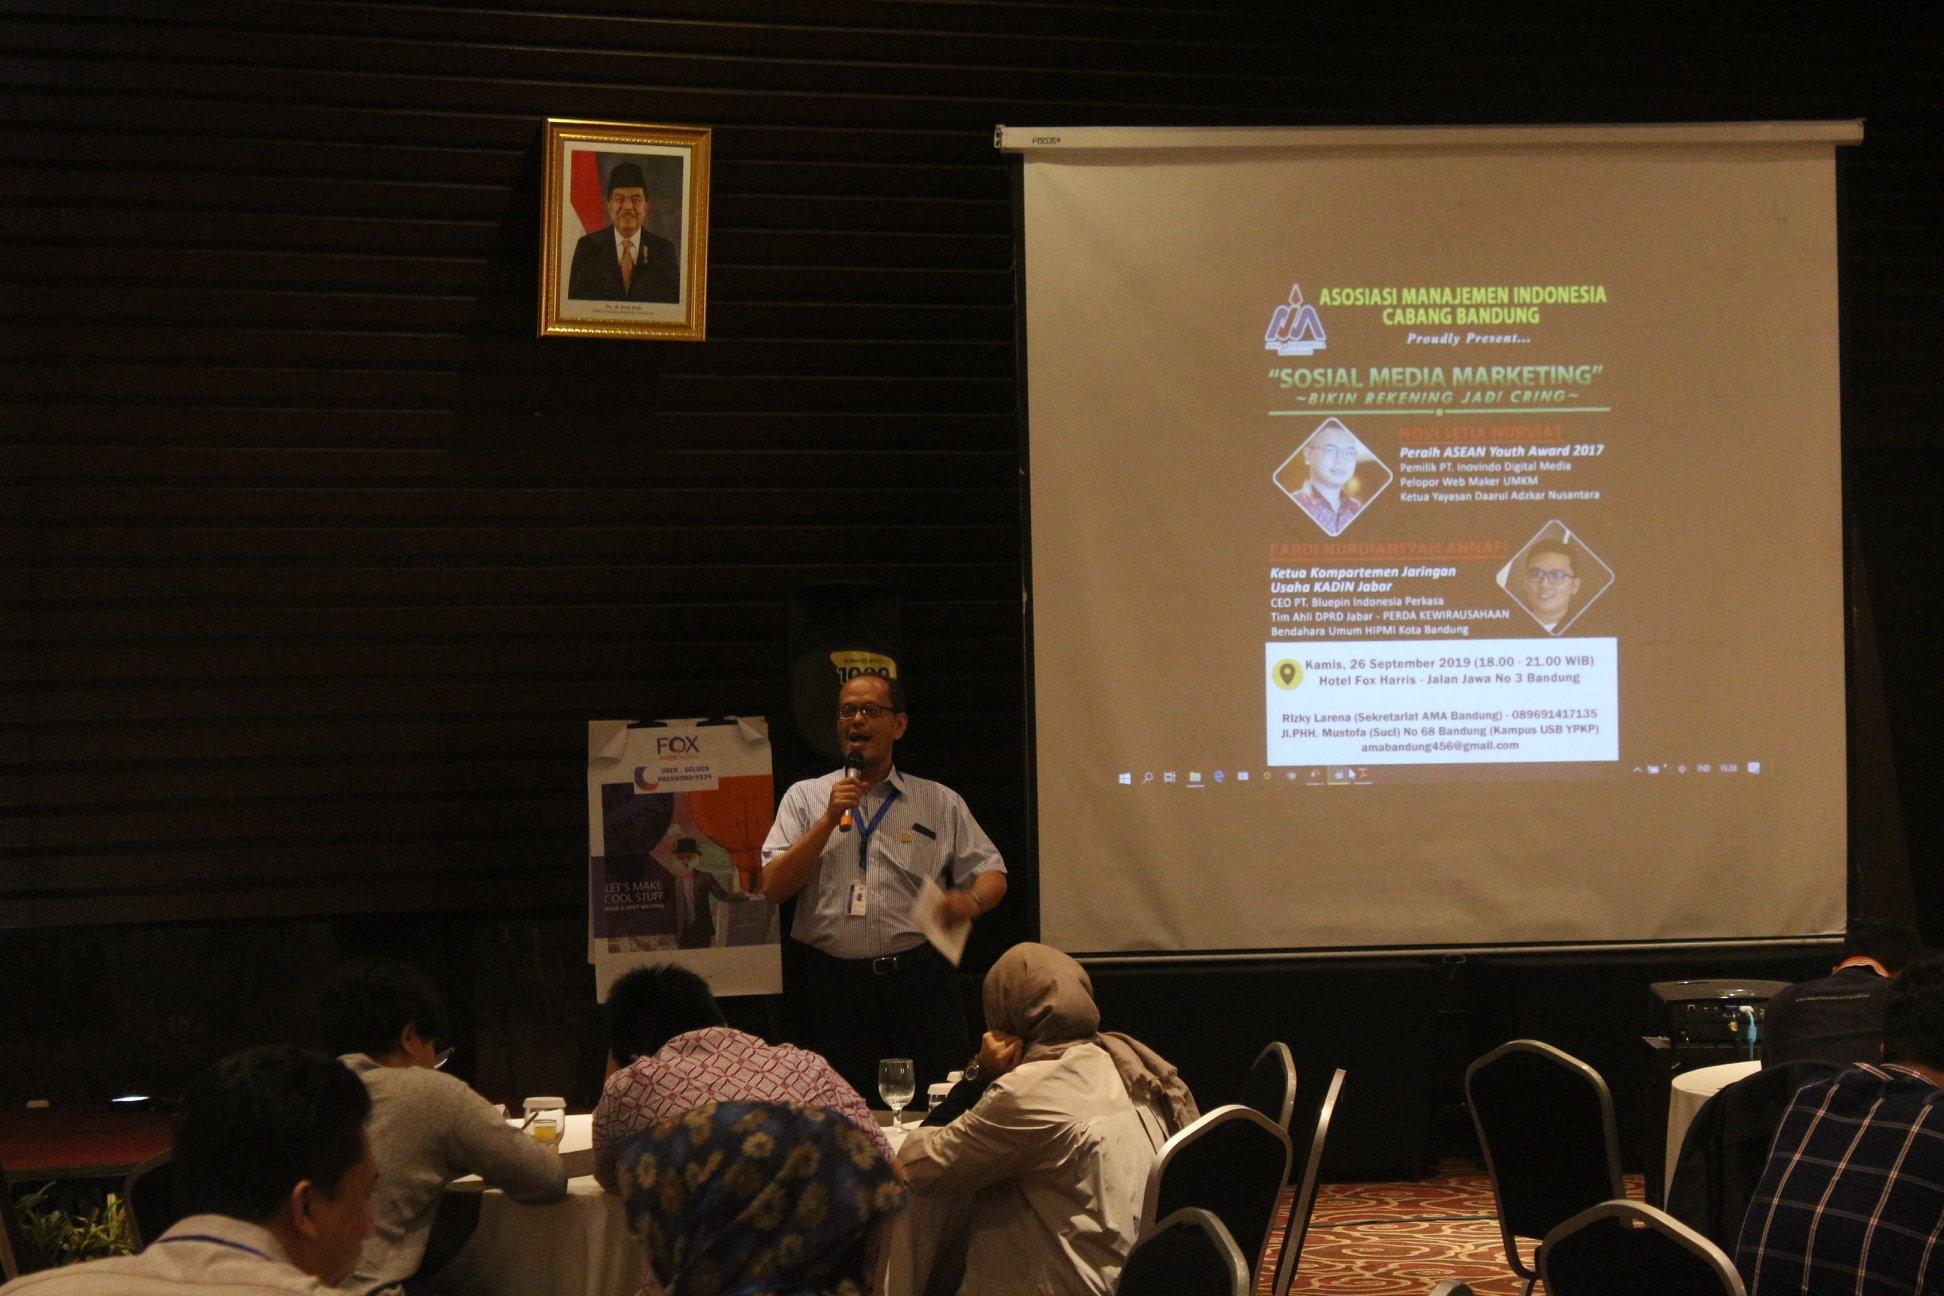 Dokumentasi Seminar AMA Bandung di Bulan September 2019